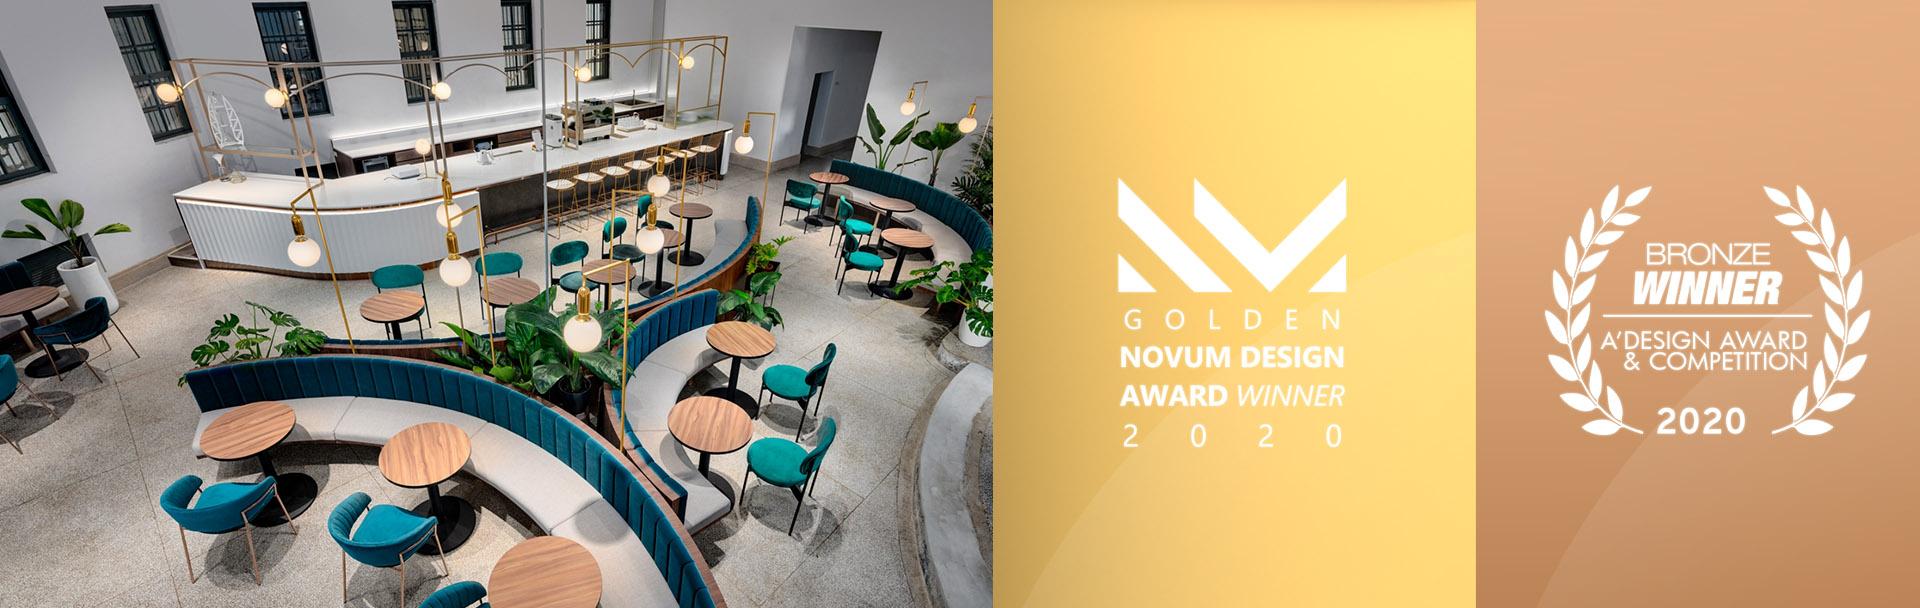 溫故知新咖啡館 revival cafe 榮獲 A'Design Award 2020銅獎